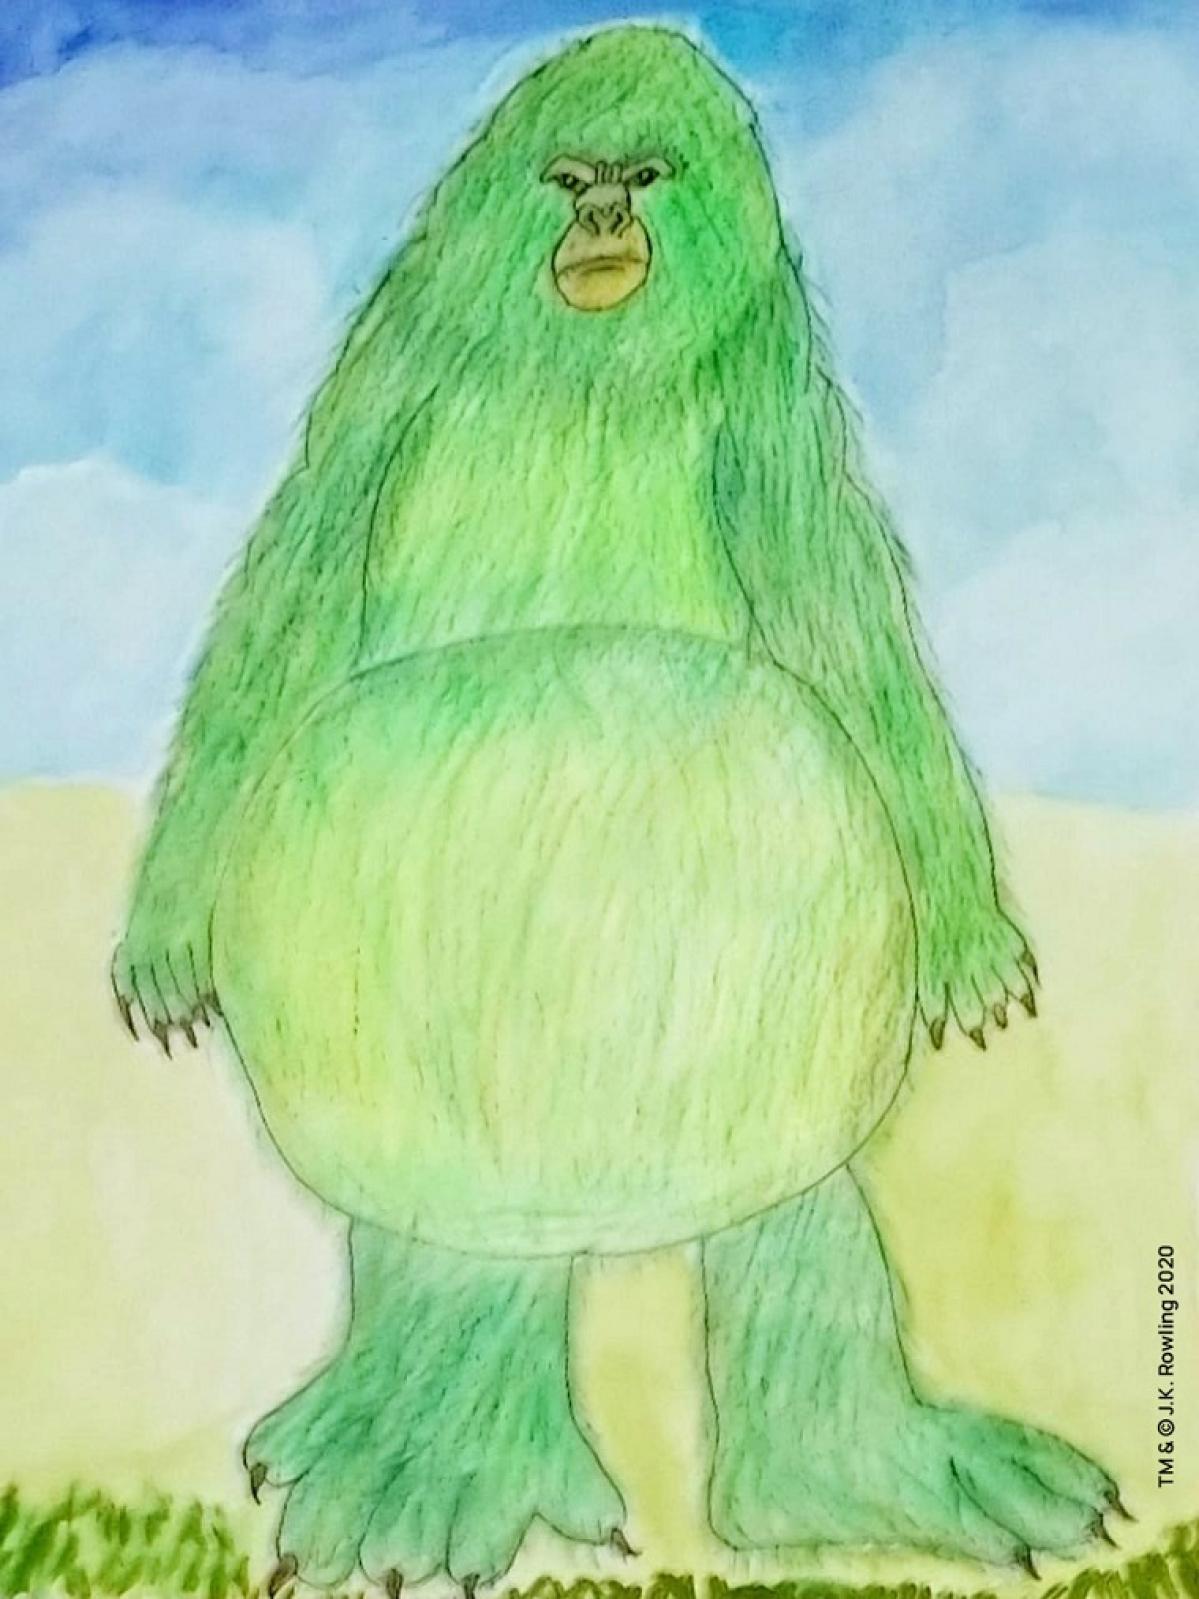 Illustration by Aron